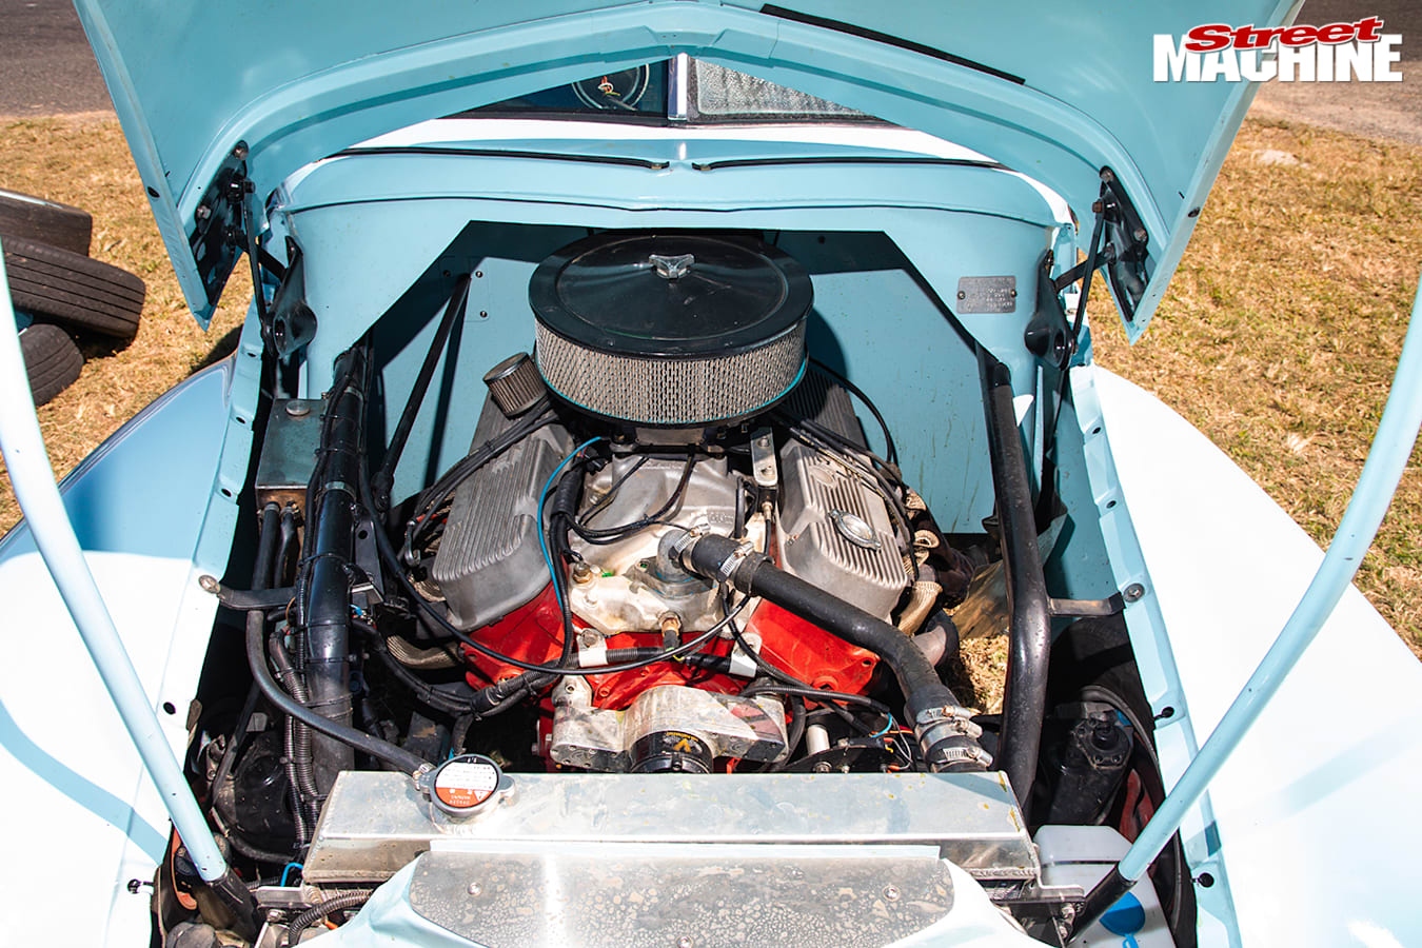 Street Machine Events Holden Fx Ute Northern Nats Engine Bay